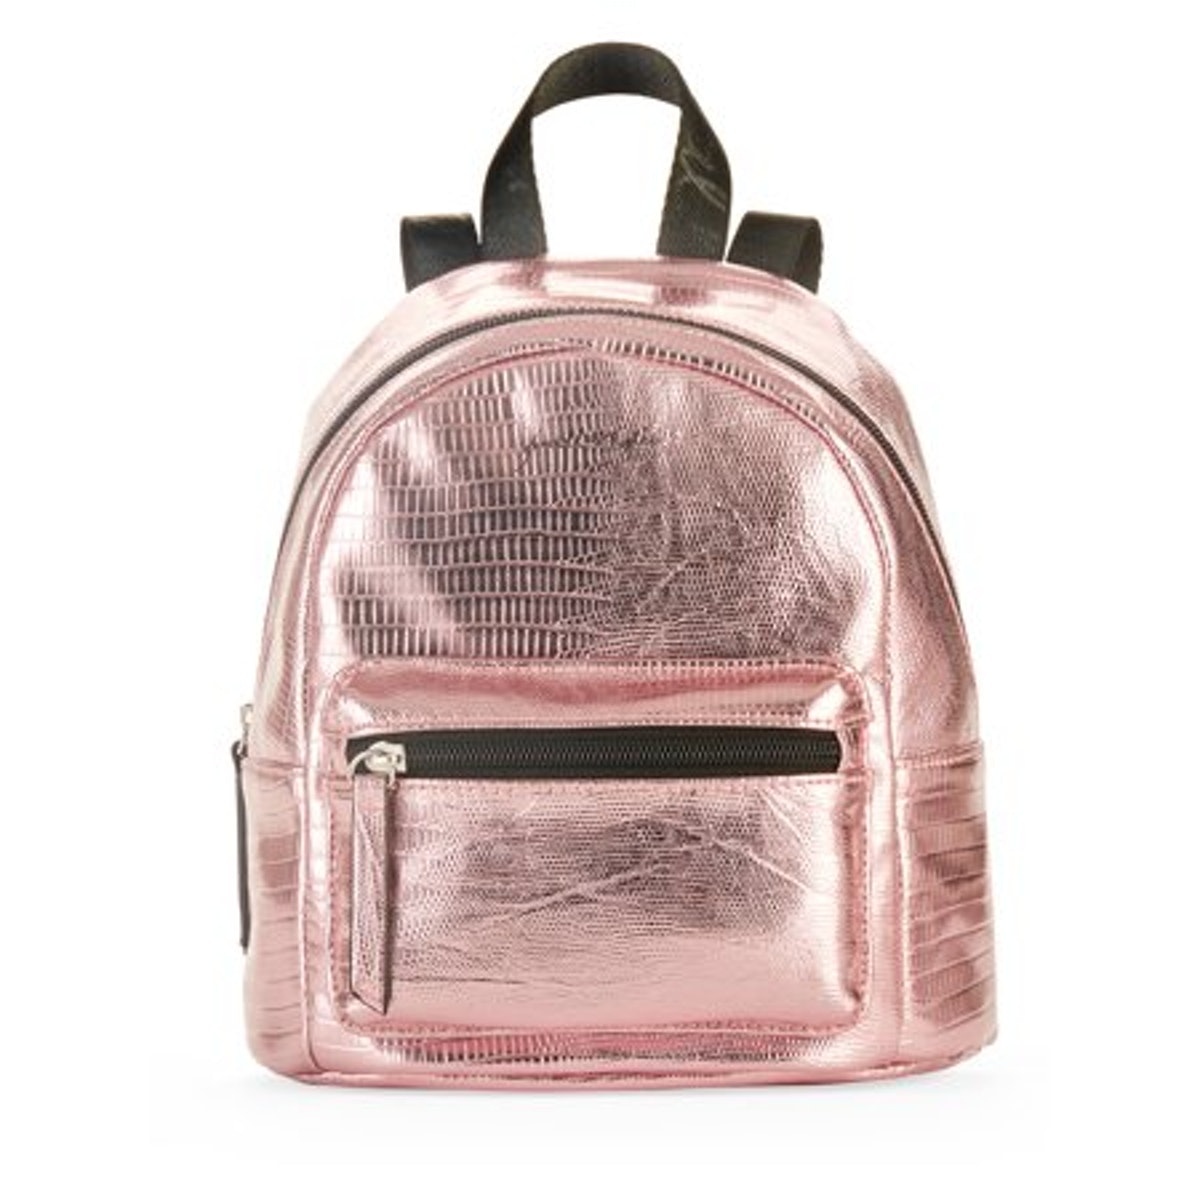 Kendall + Kylie For Walmart Pink Metallic Snake Backpack